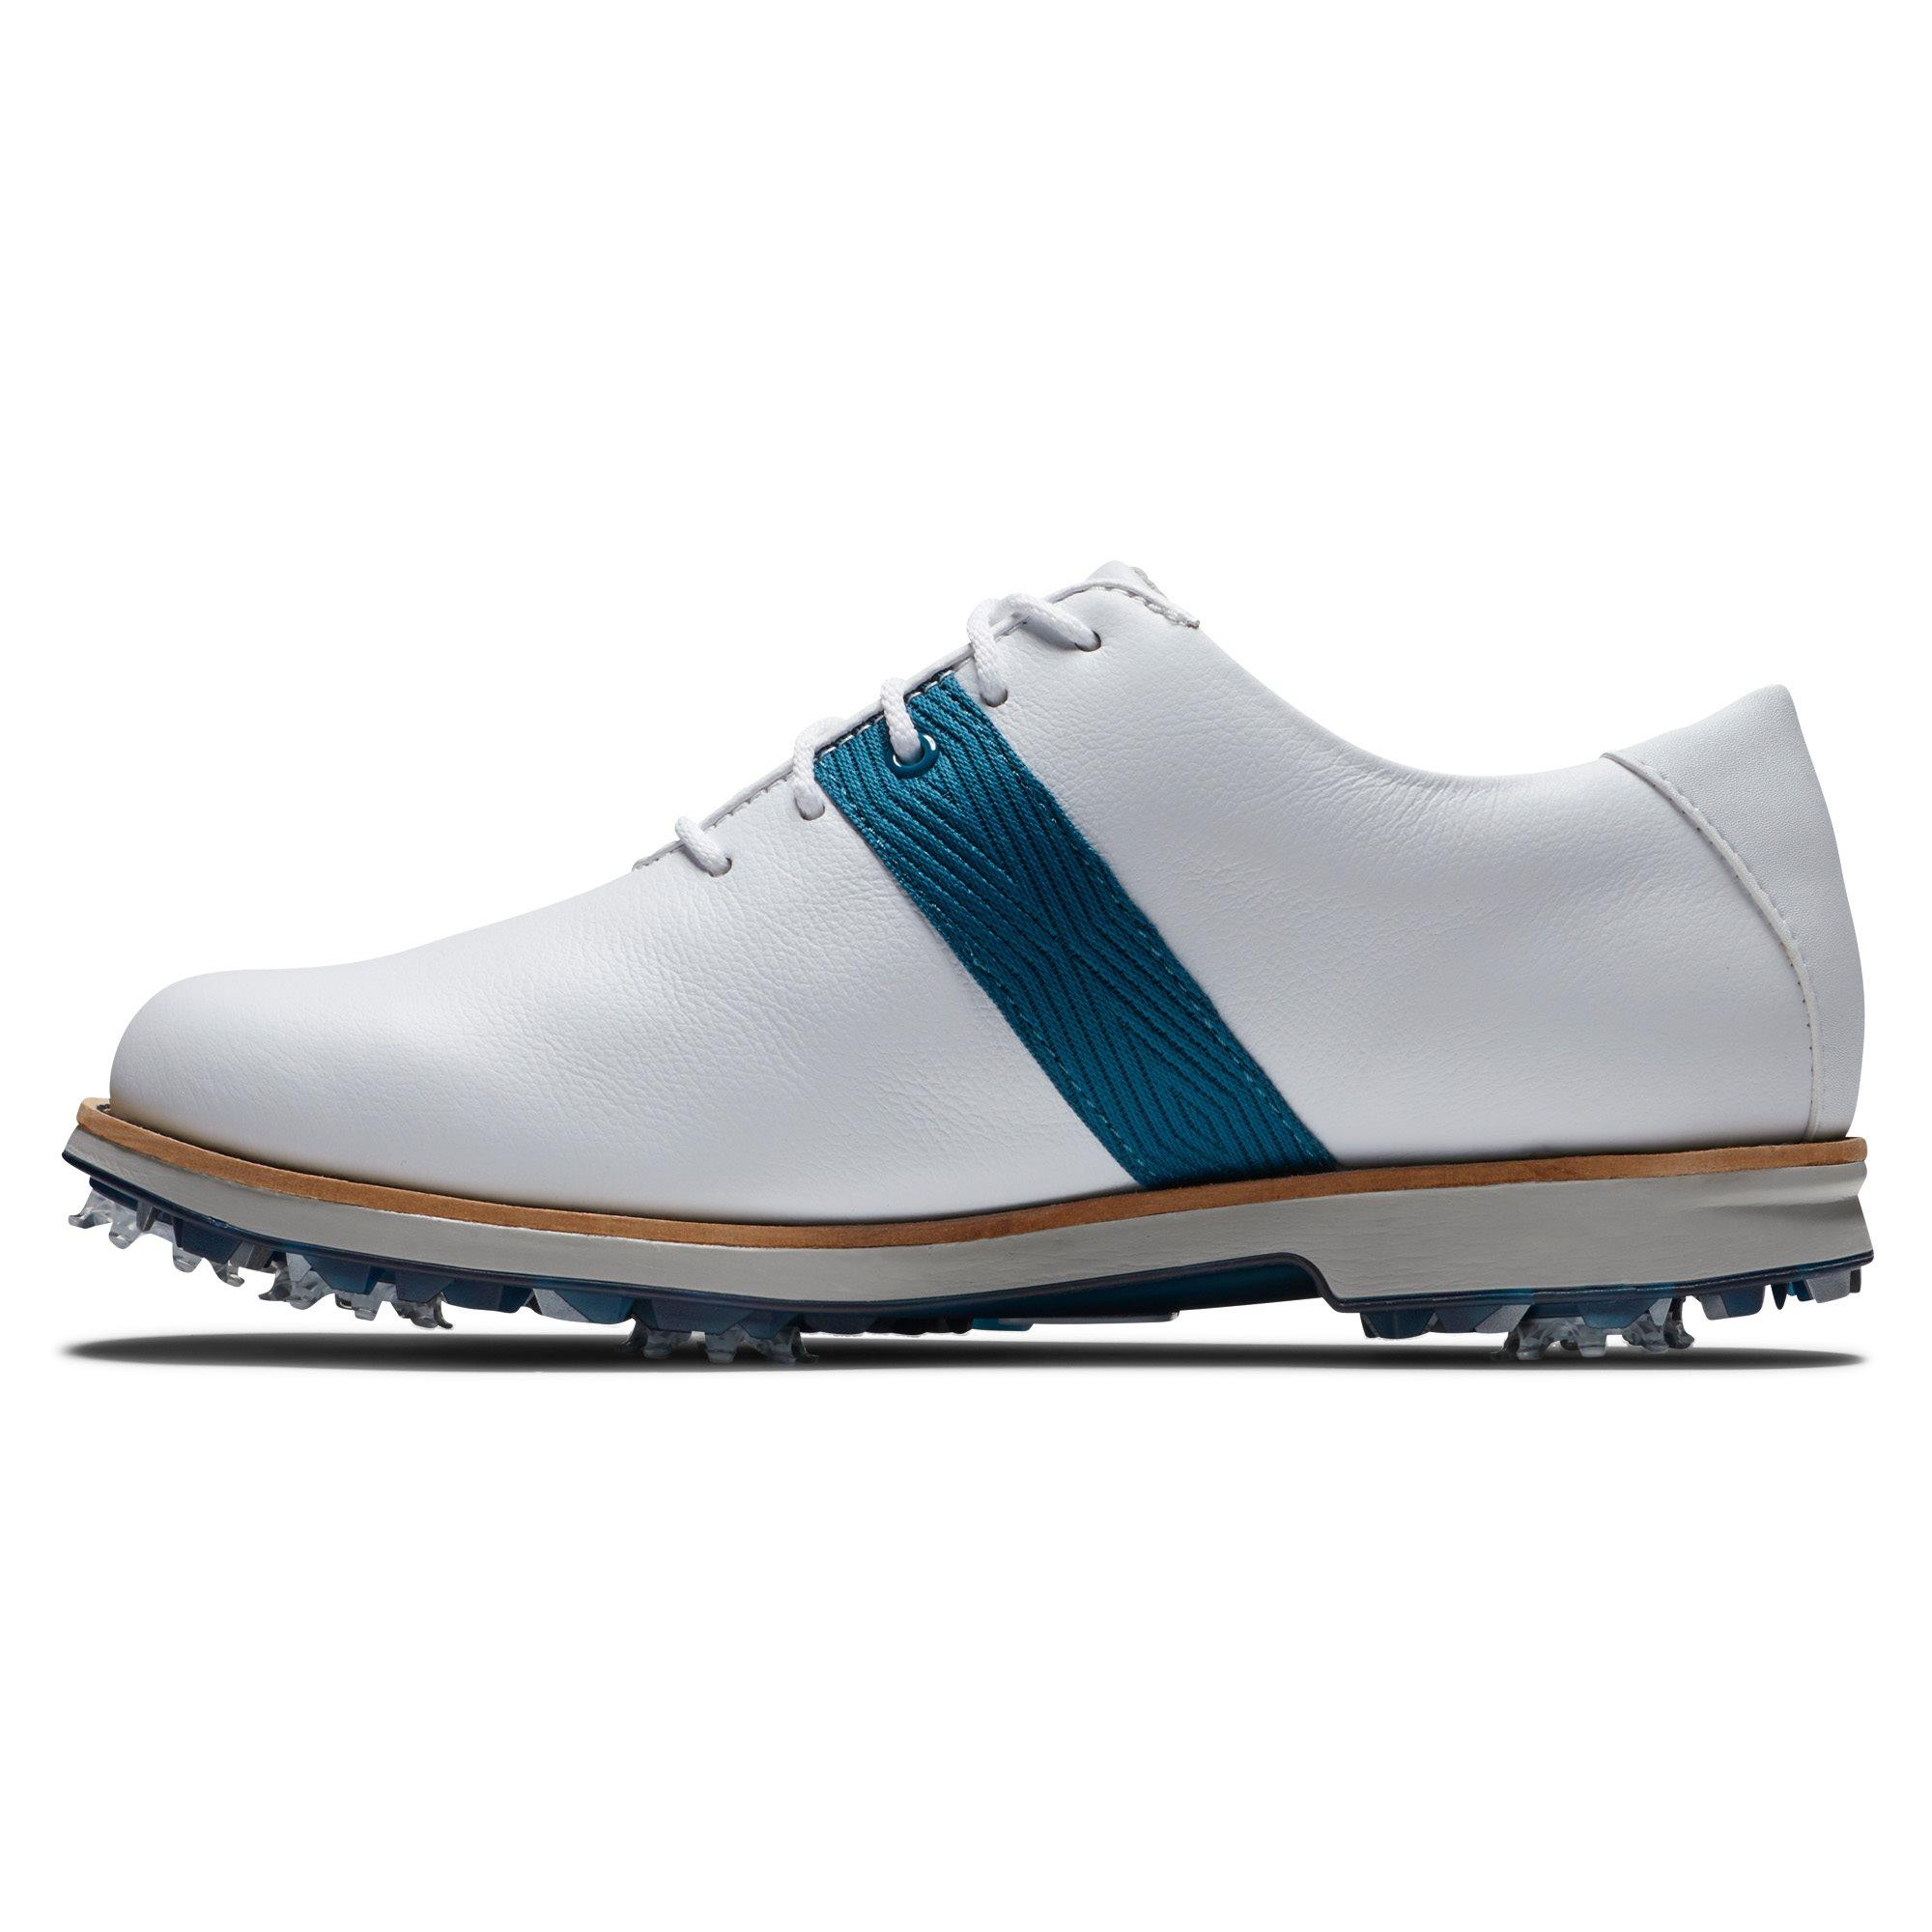 FootJoy dames golfschoenen Premiere Series wit-blauw